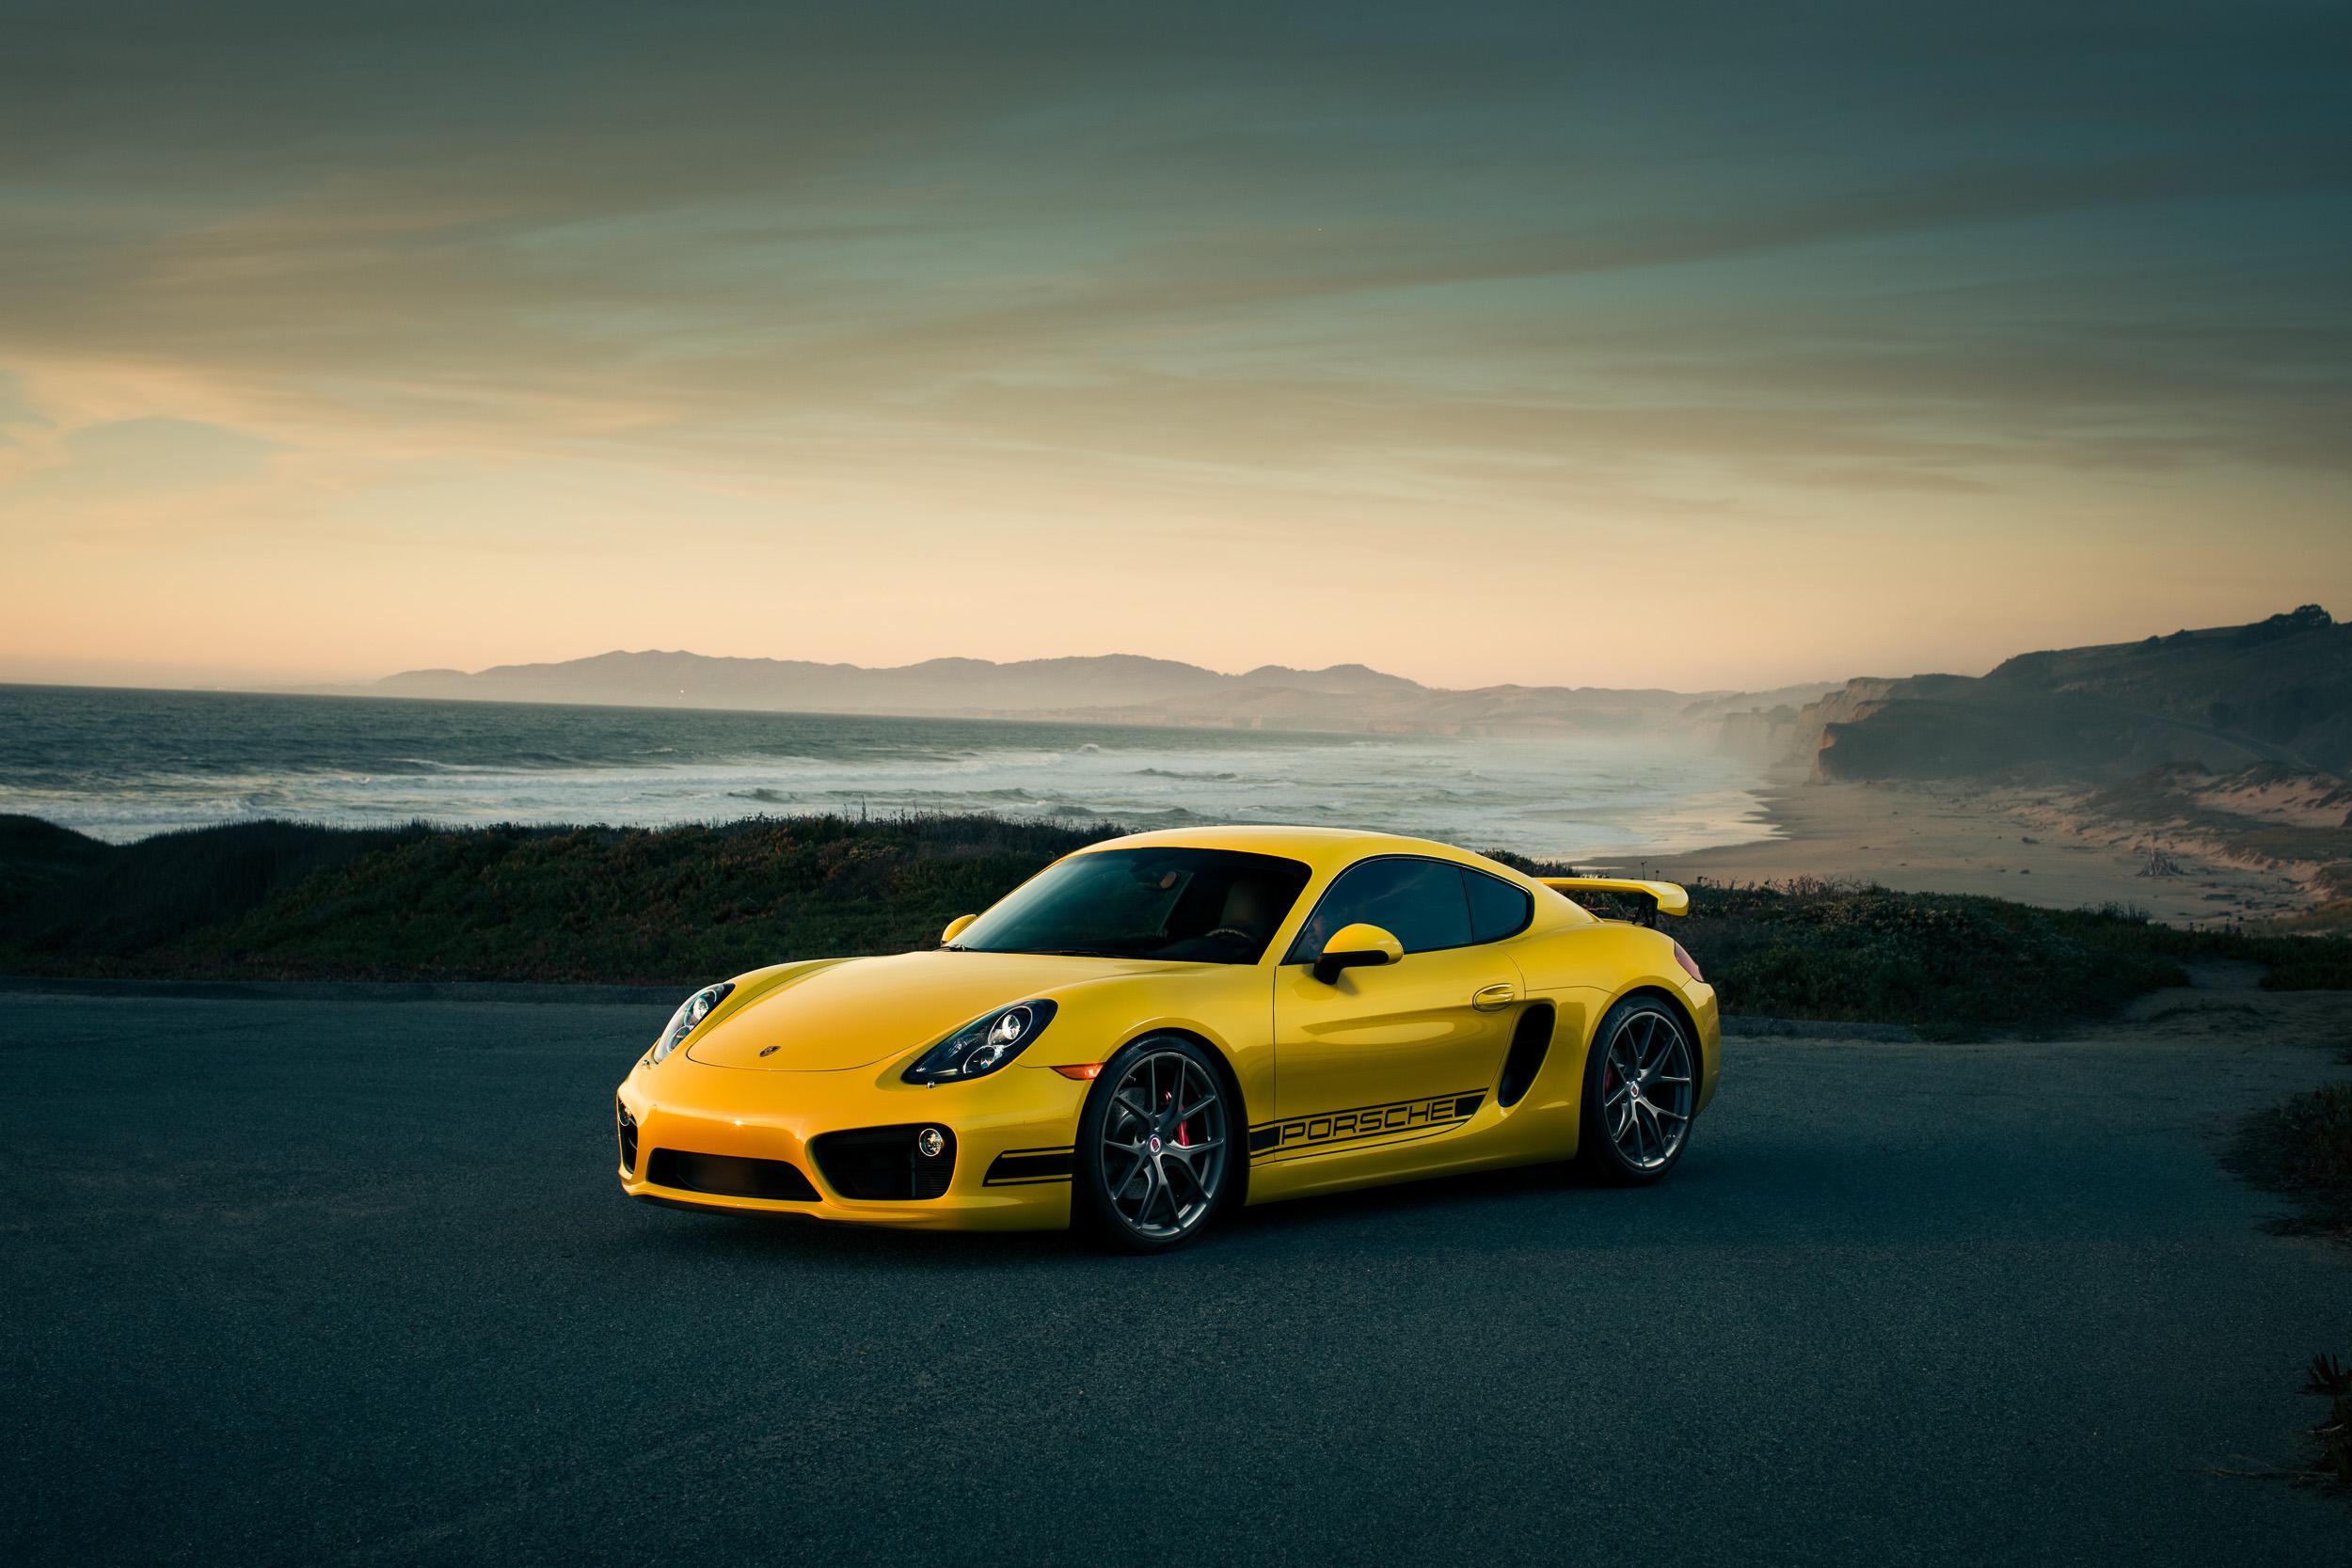 David Bush Automotive Photography San Francisco Bay Area Porsche Cayman